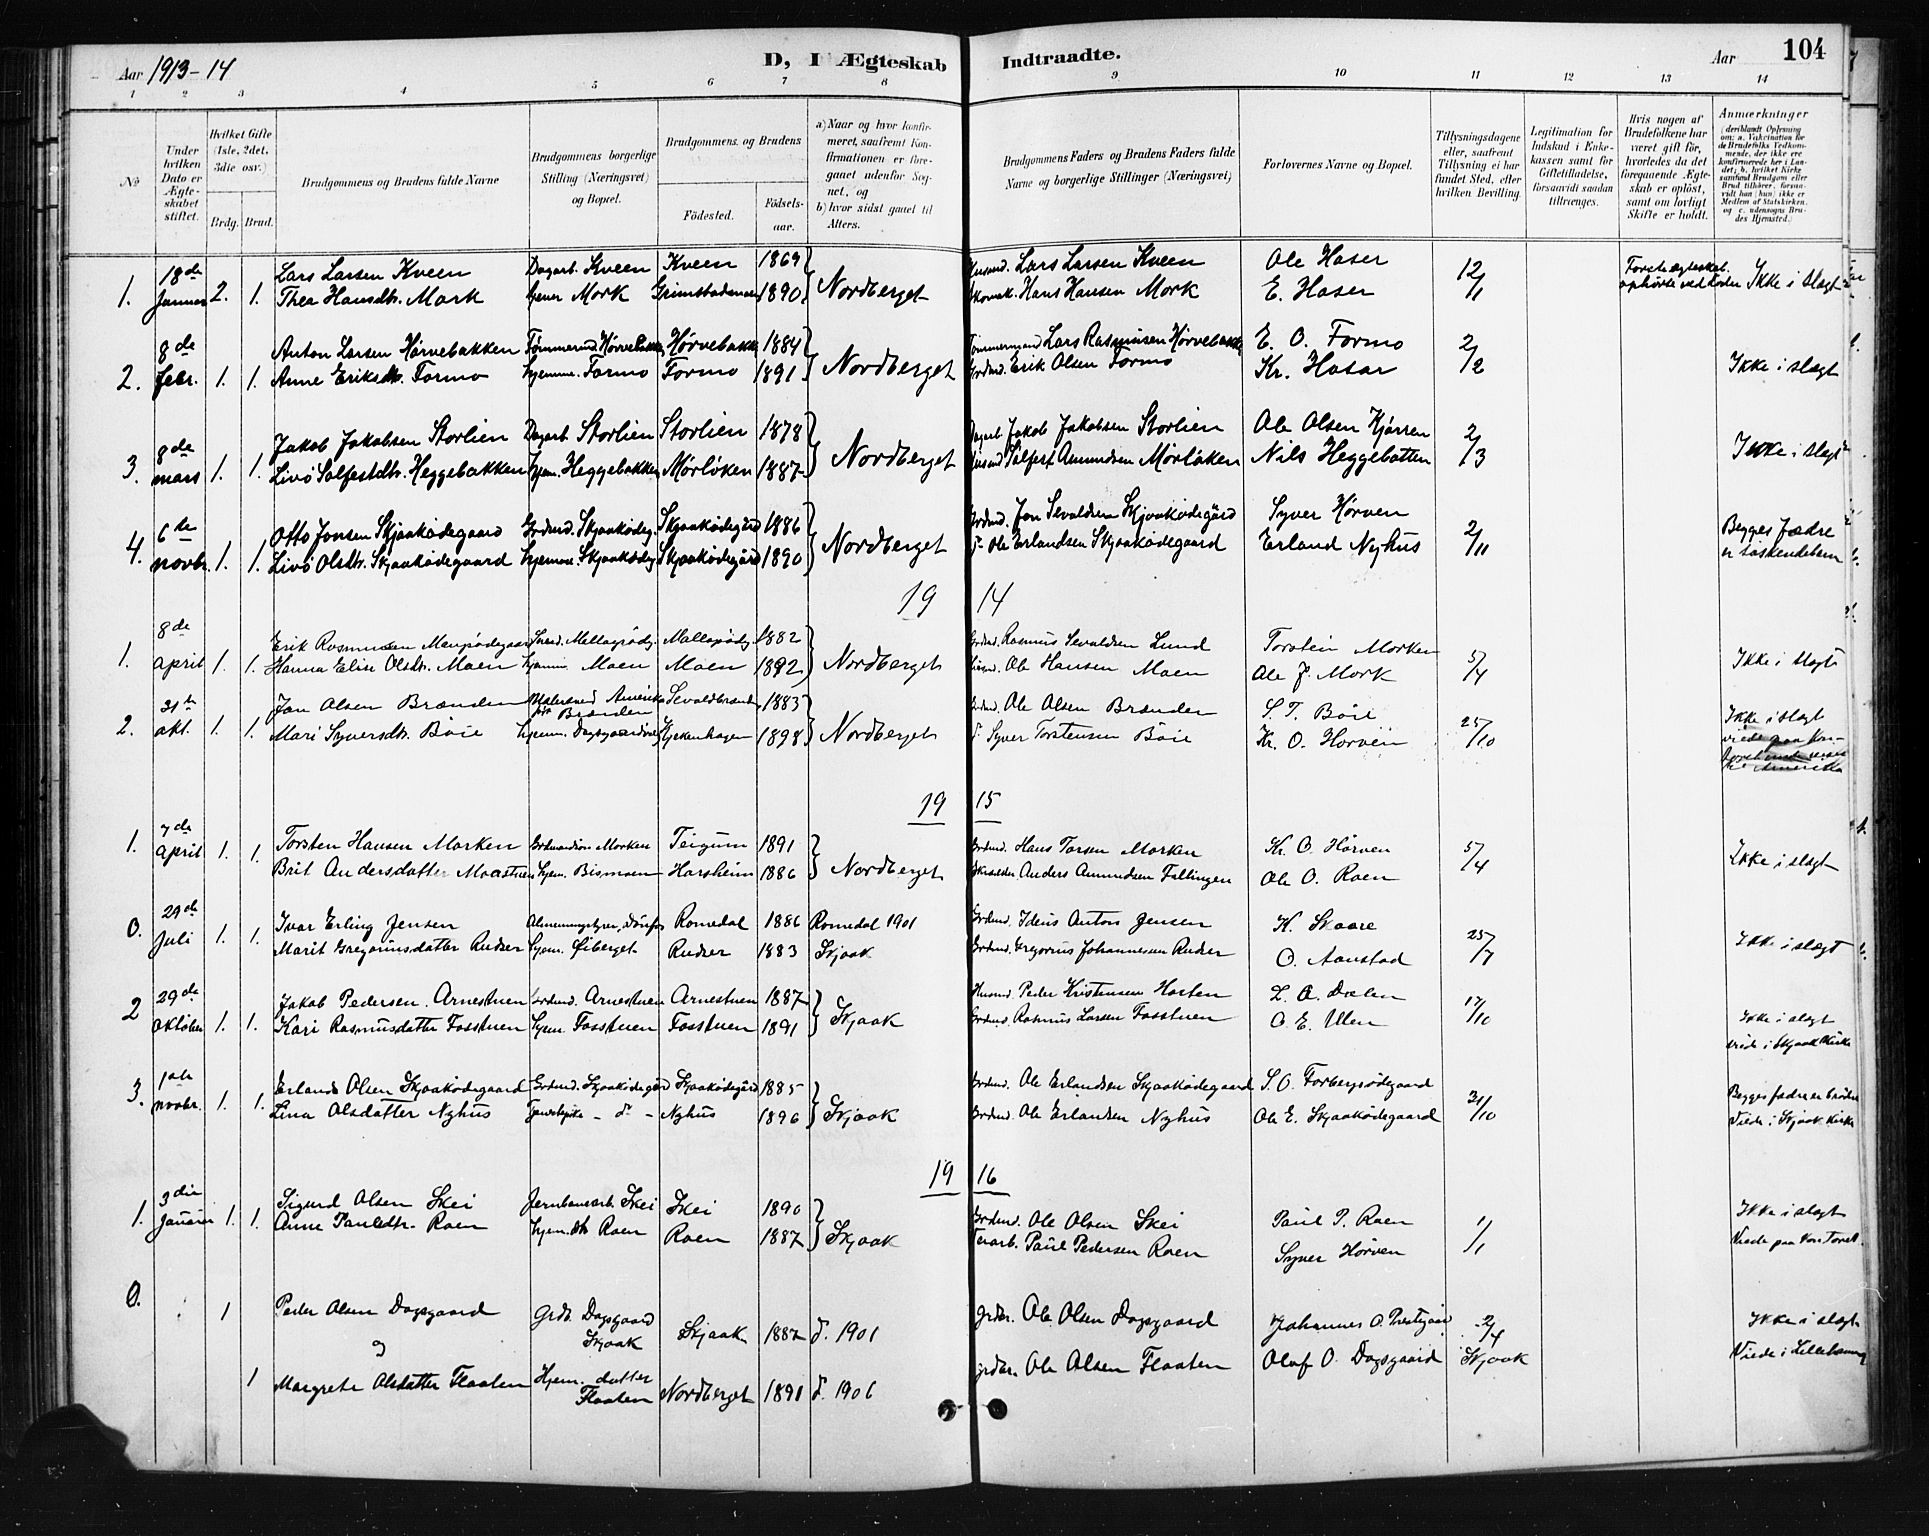 SAH, Skjåk prestekontor, Klokkerbok nr. 4, 1895-1921, s. 104